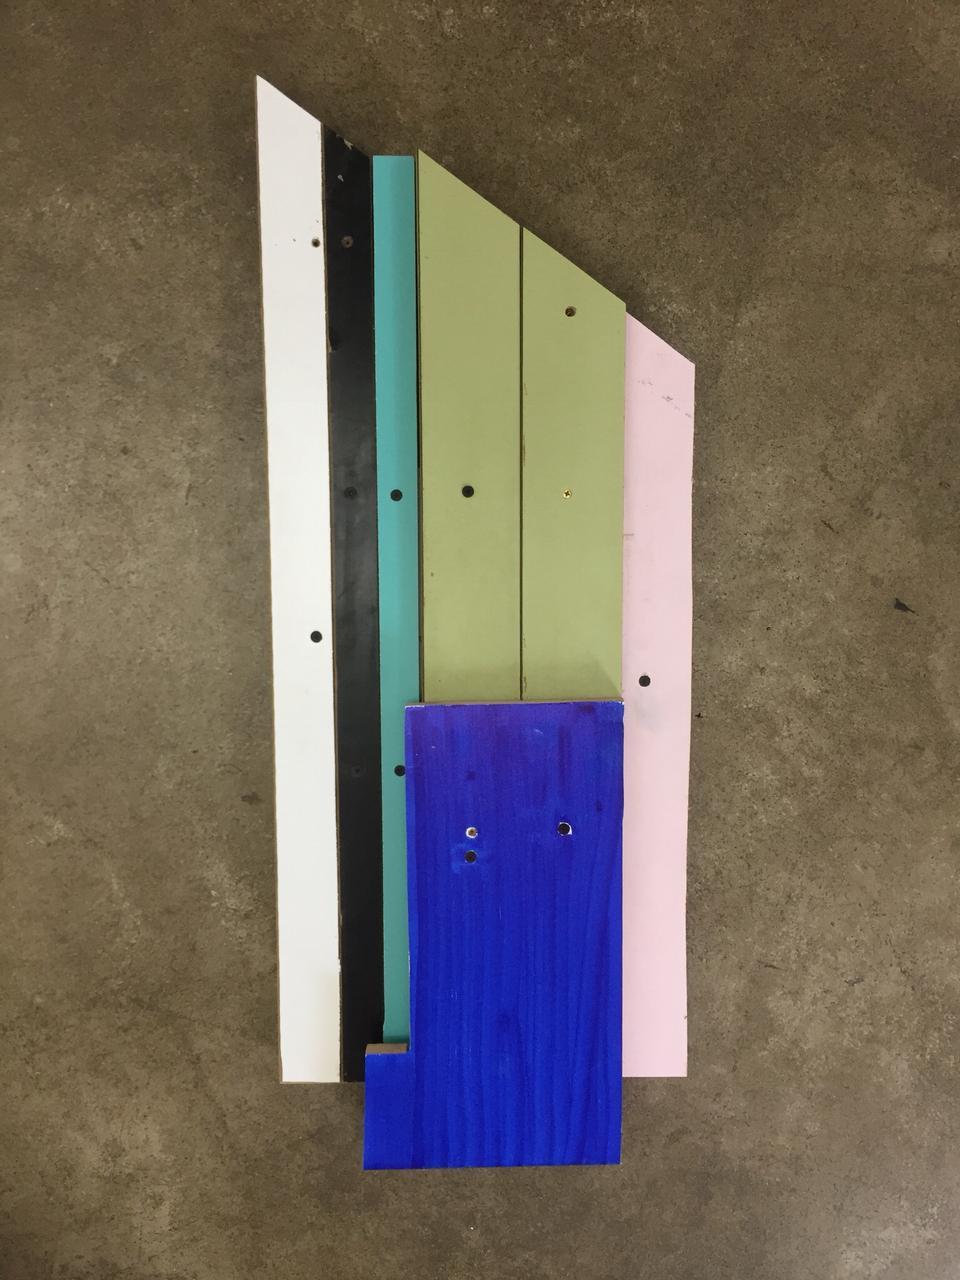 Christian Henkel, BH VI, Madeira, 38 x 78 cm, 2018